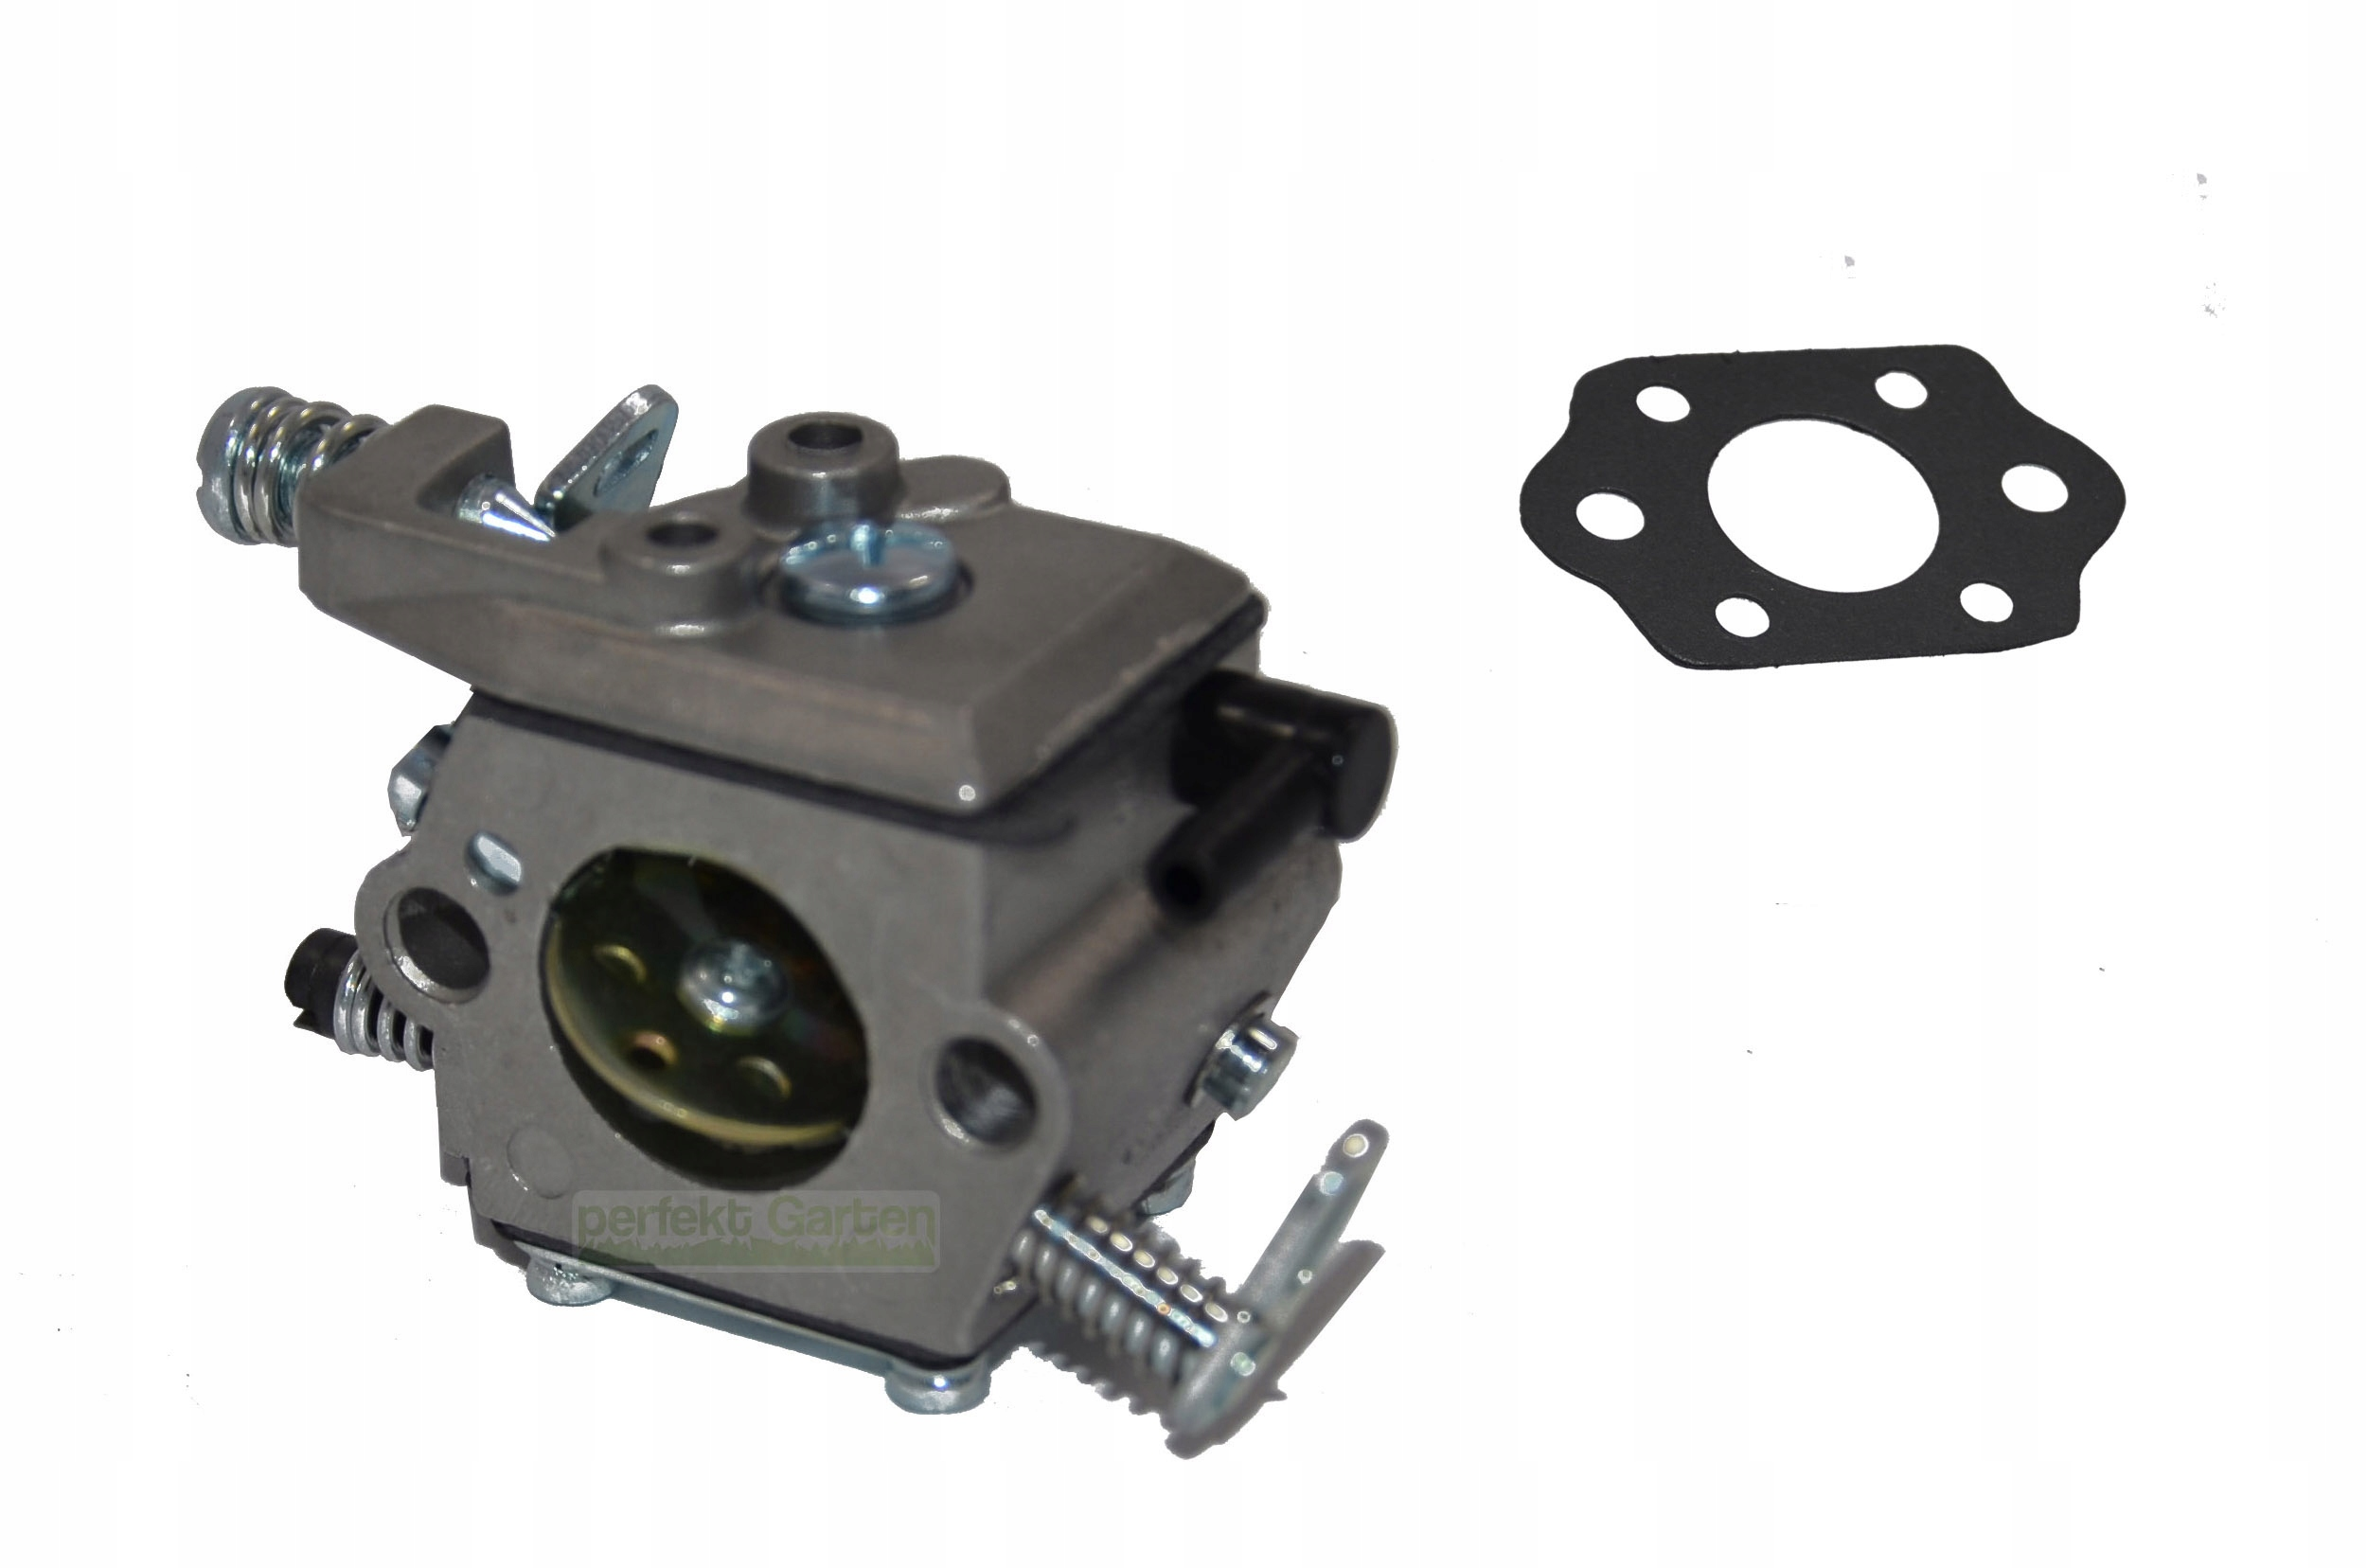 karburátor píl STIHL 021 023 025 MS 210 230 250 Walbr